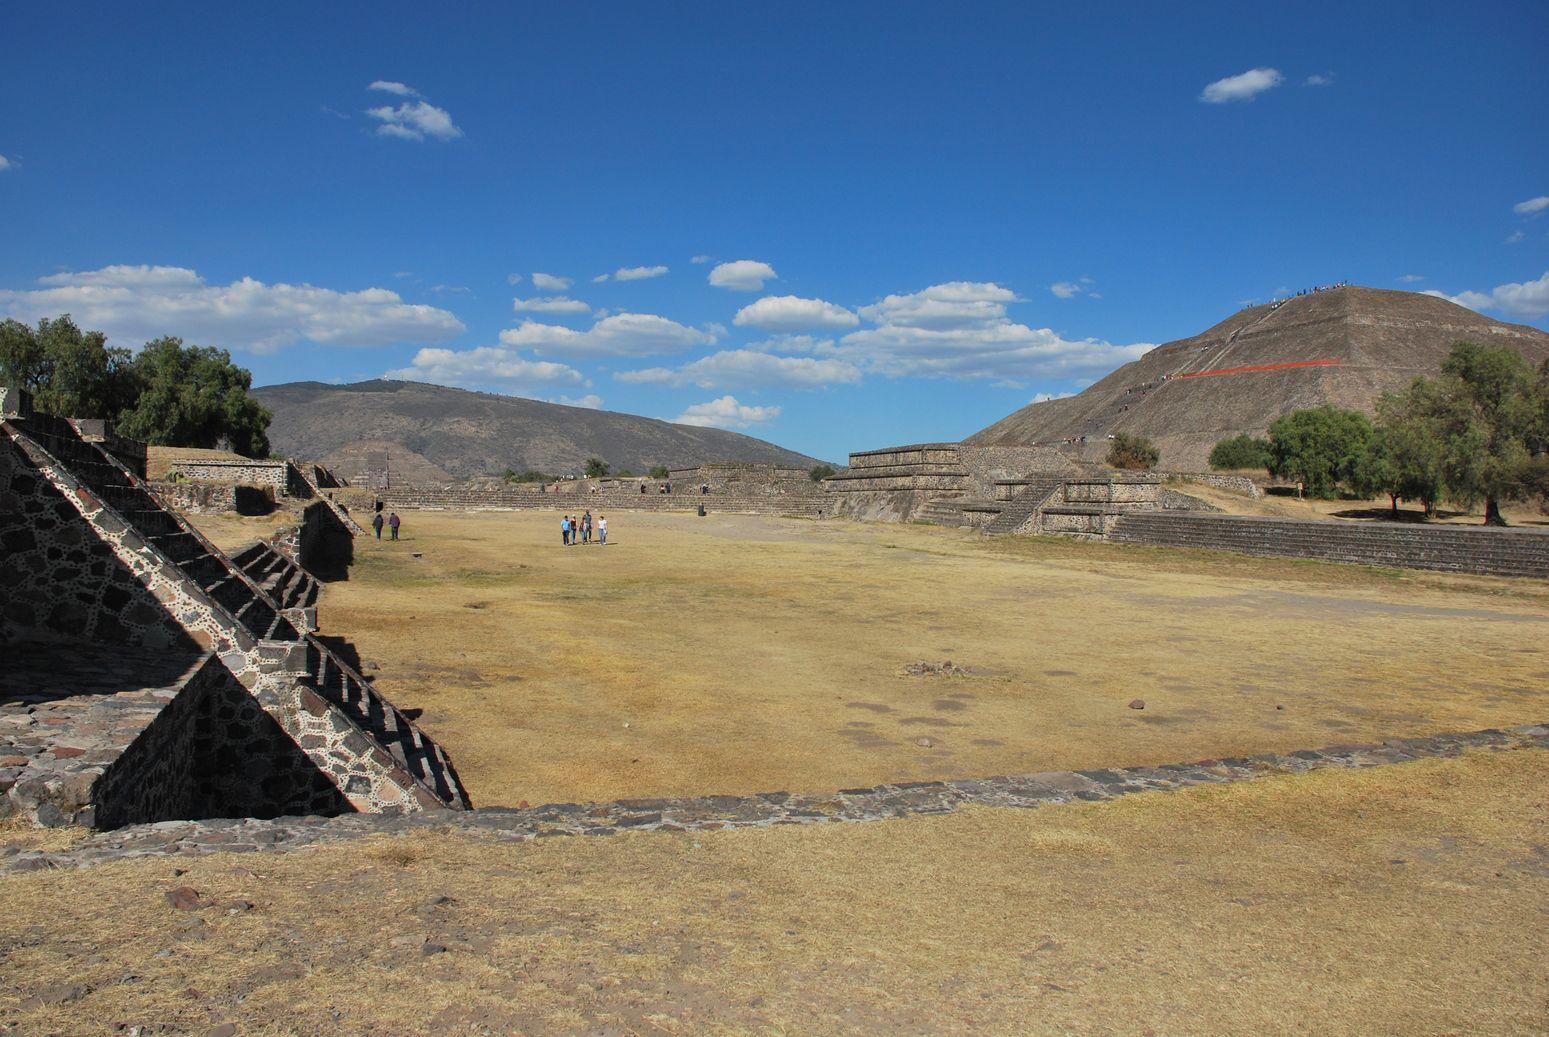 J 117 et 118: Tula et Teotihuacan